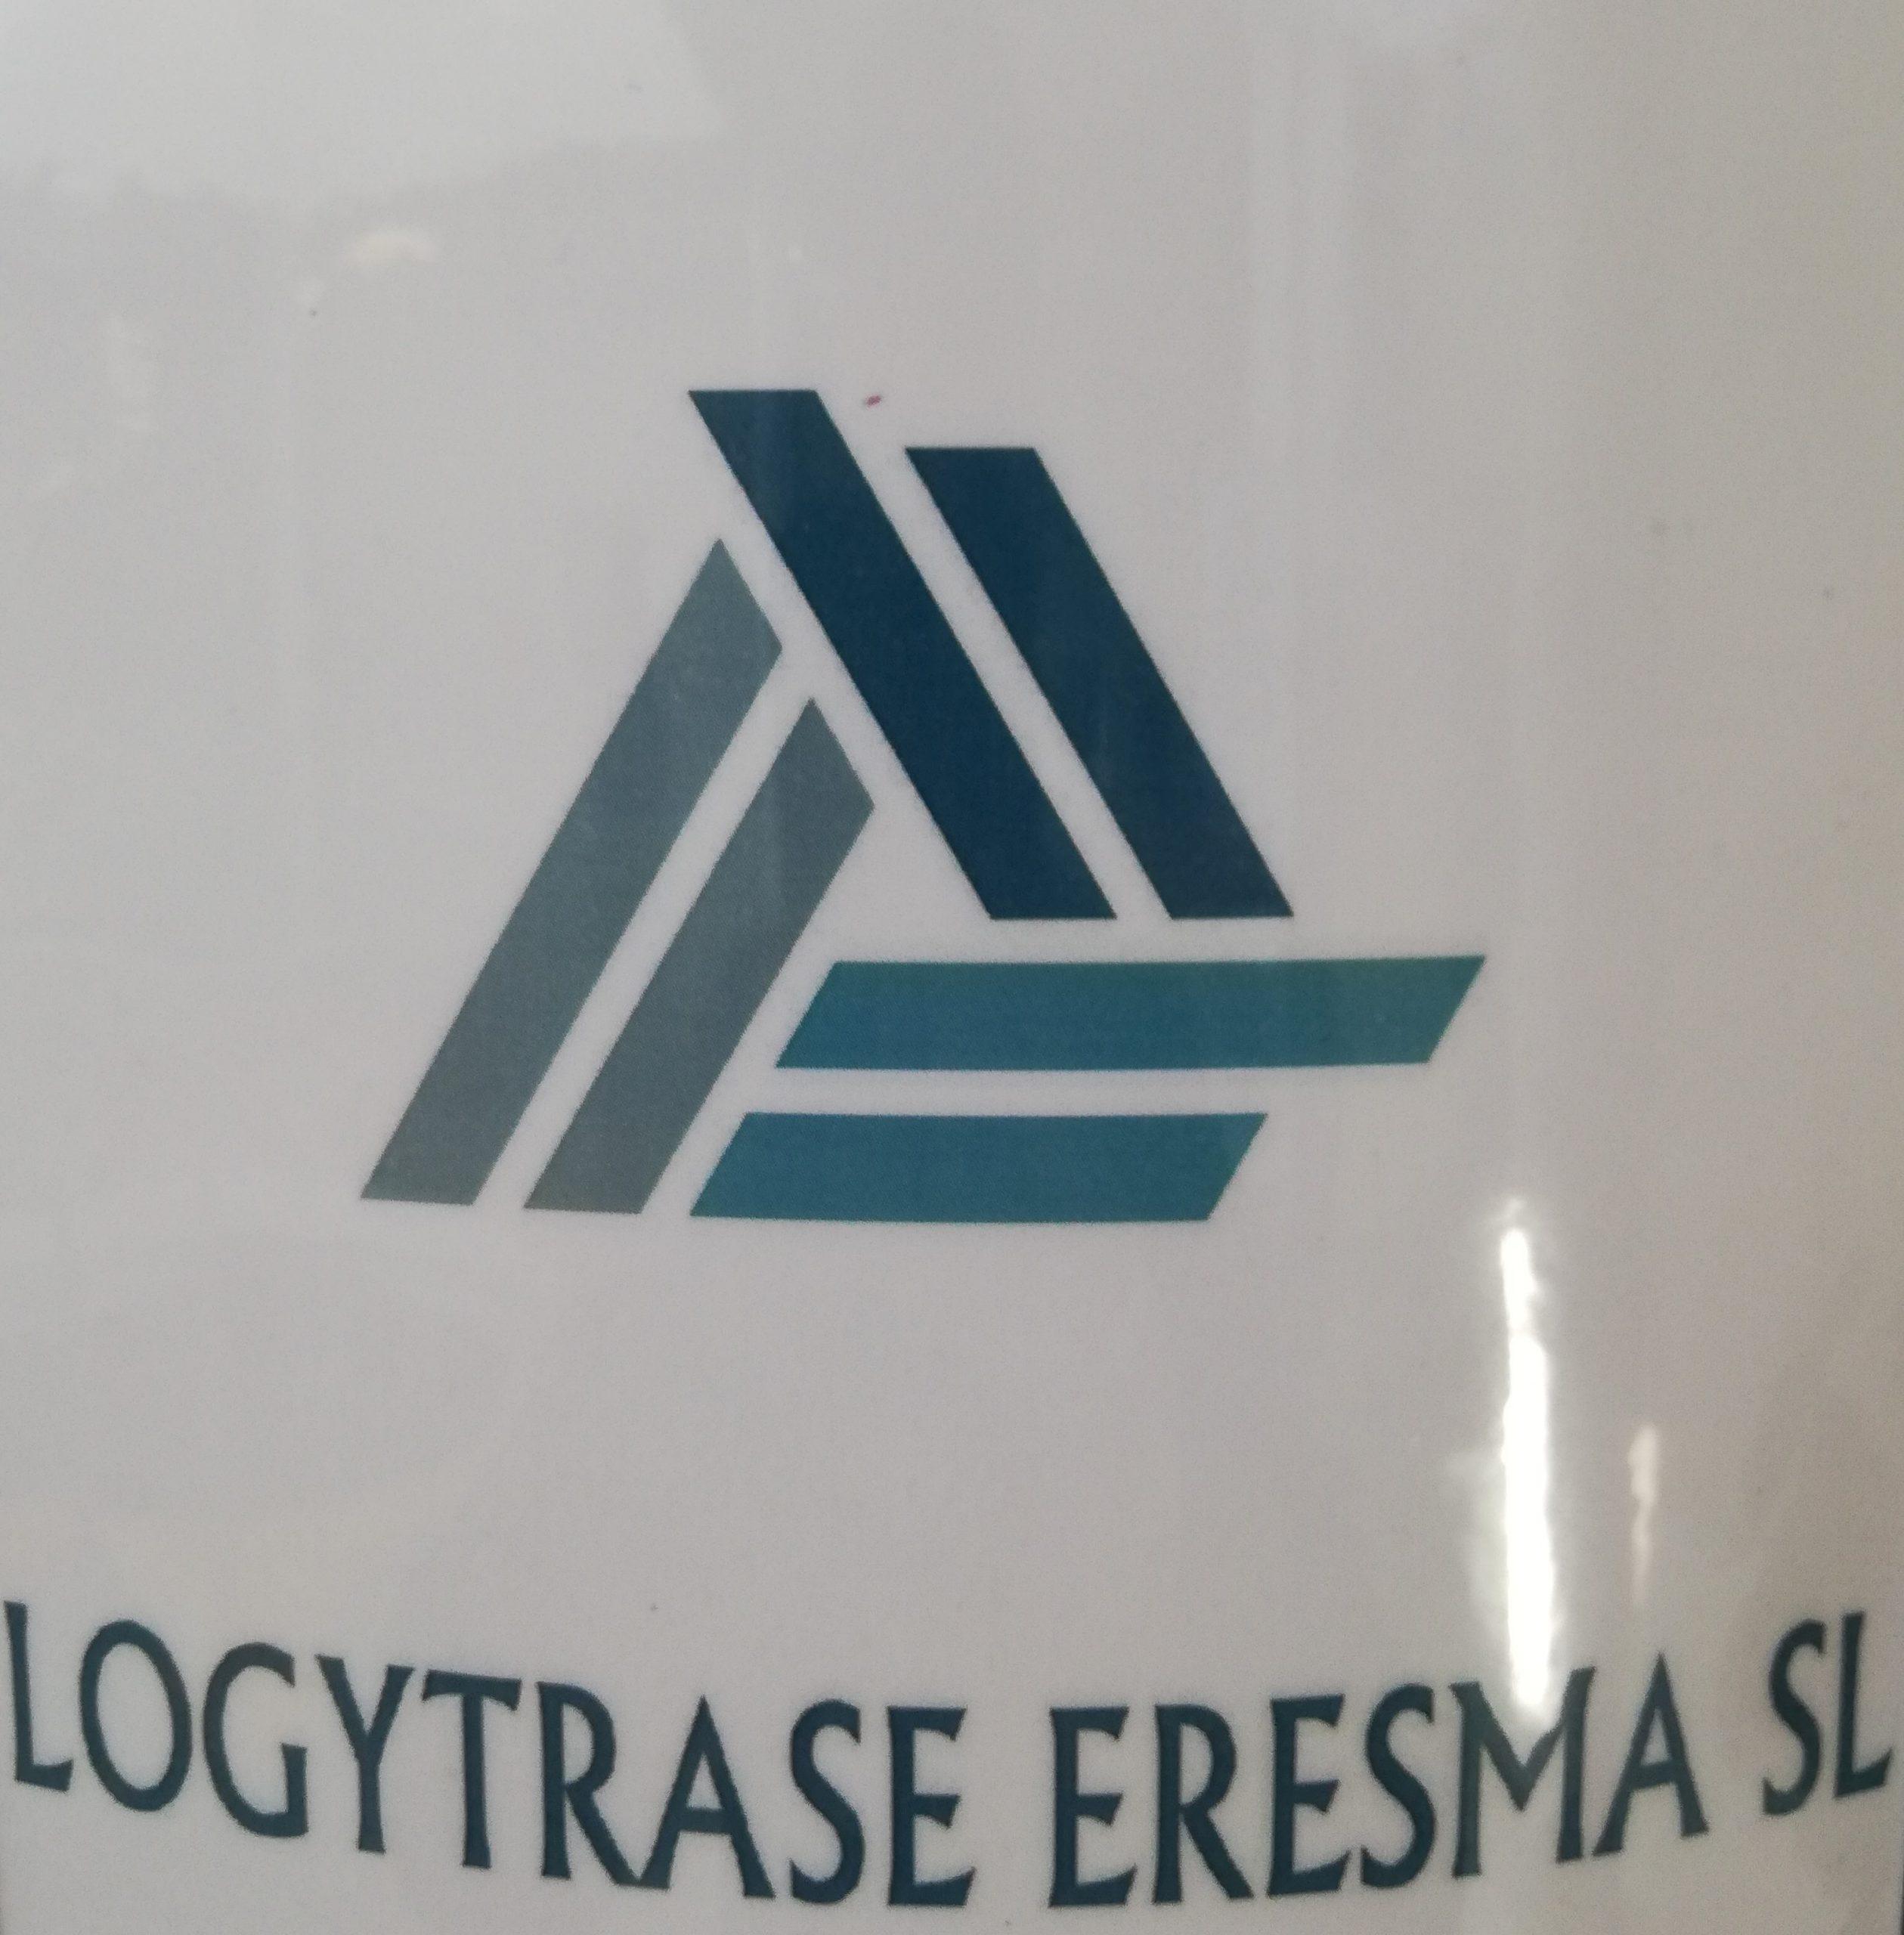 LOGYTRASE ERESMA SL